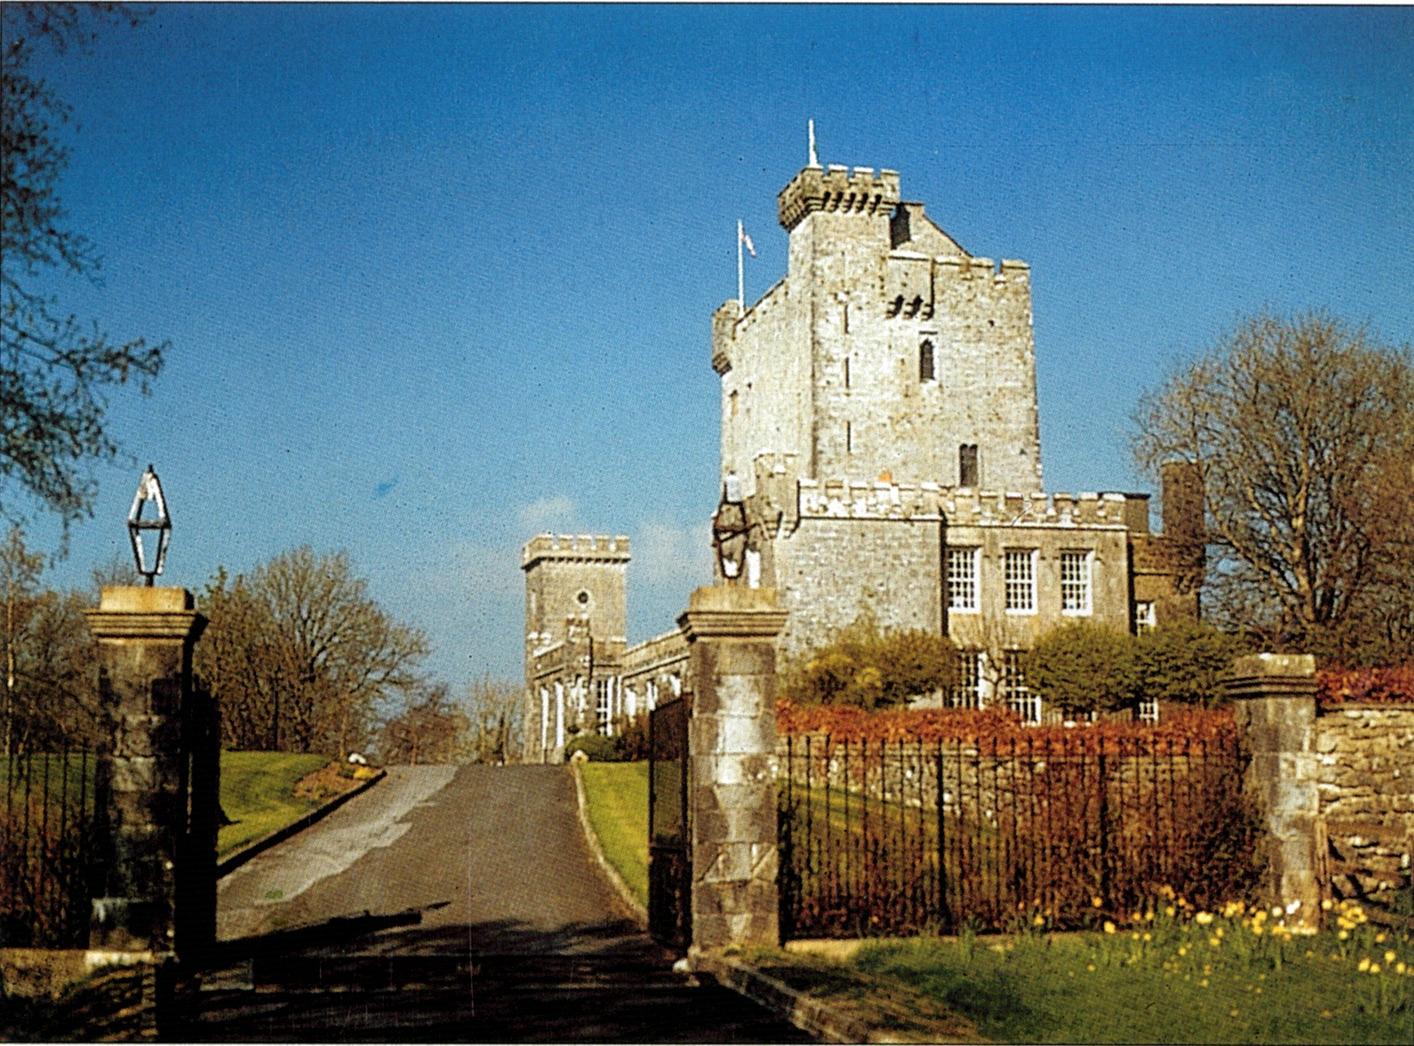 Tower House Castle, Co. Quin